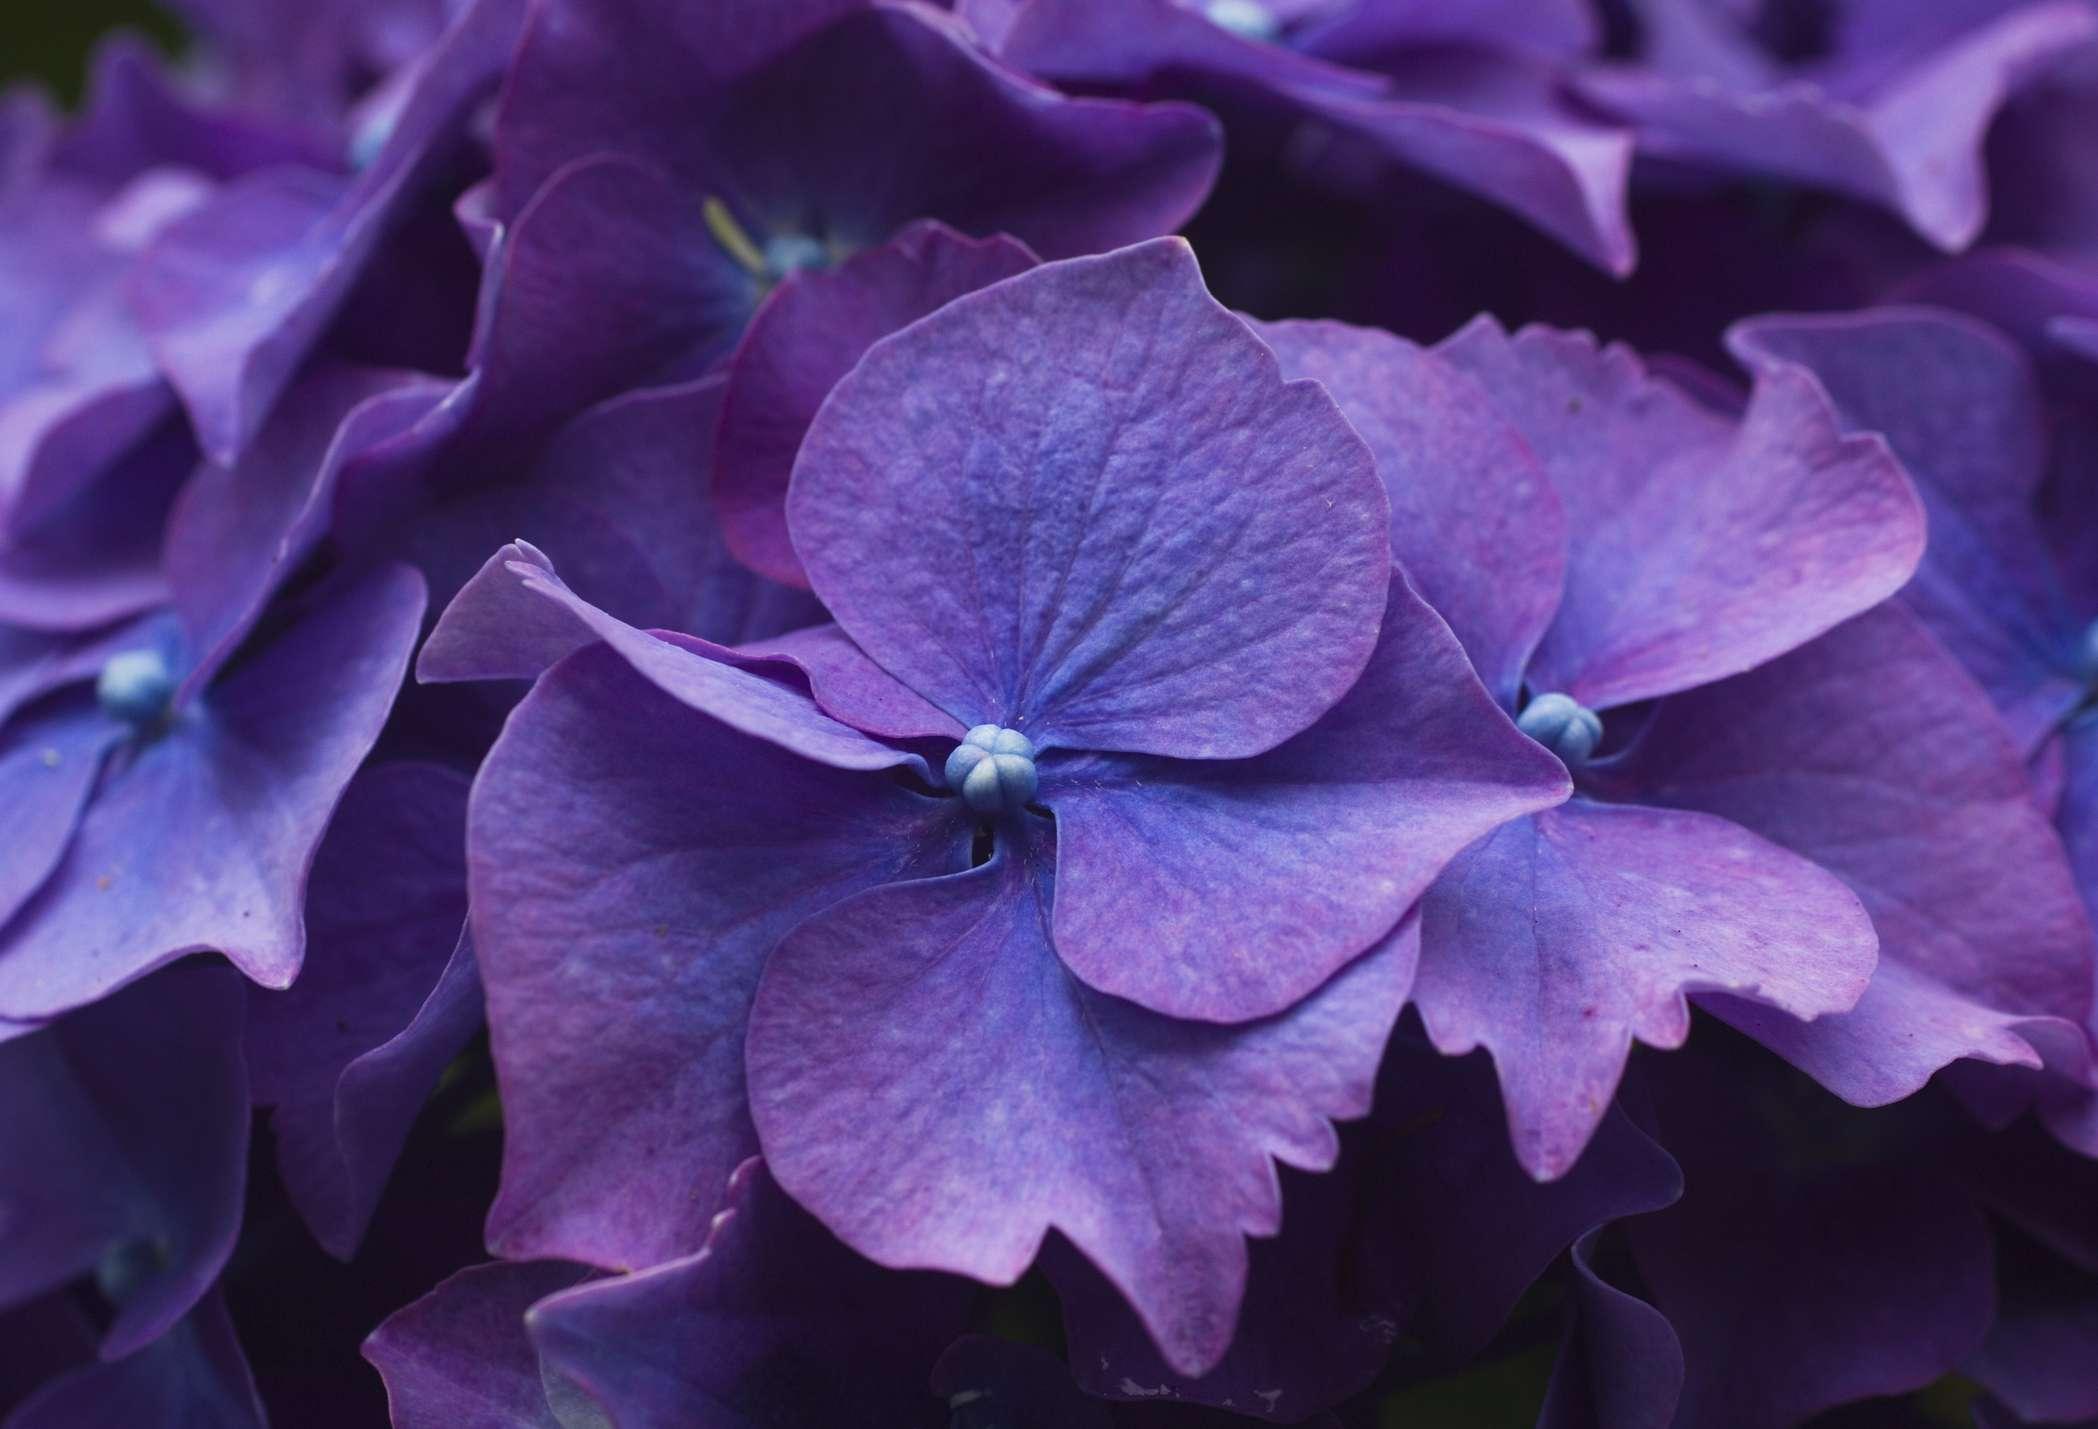 Sepals of purple hydrangea shrub flower